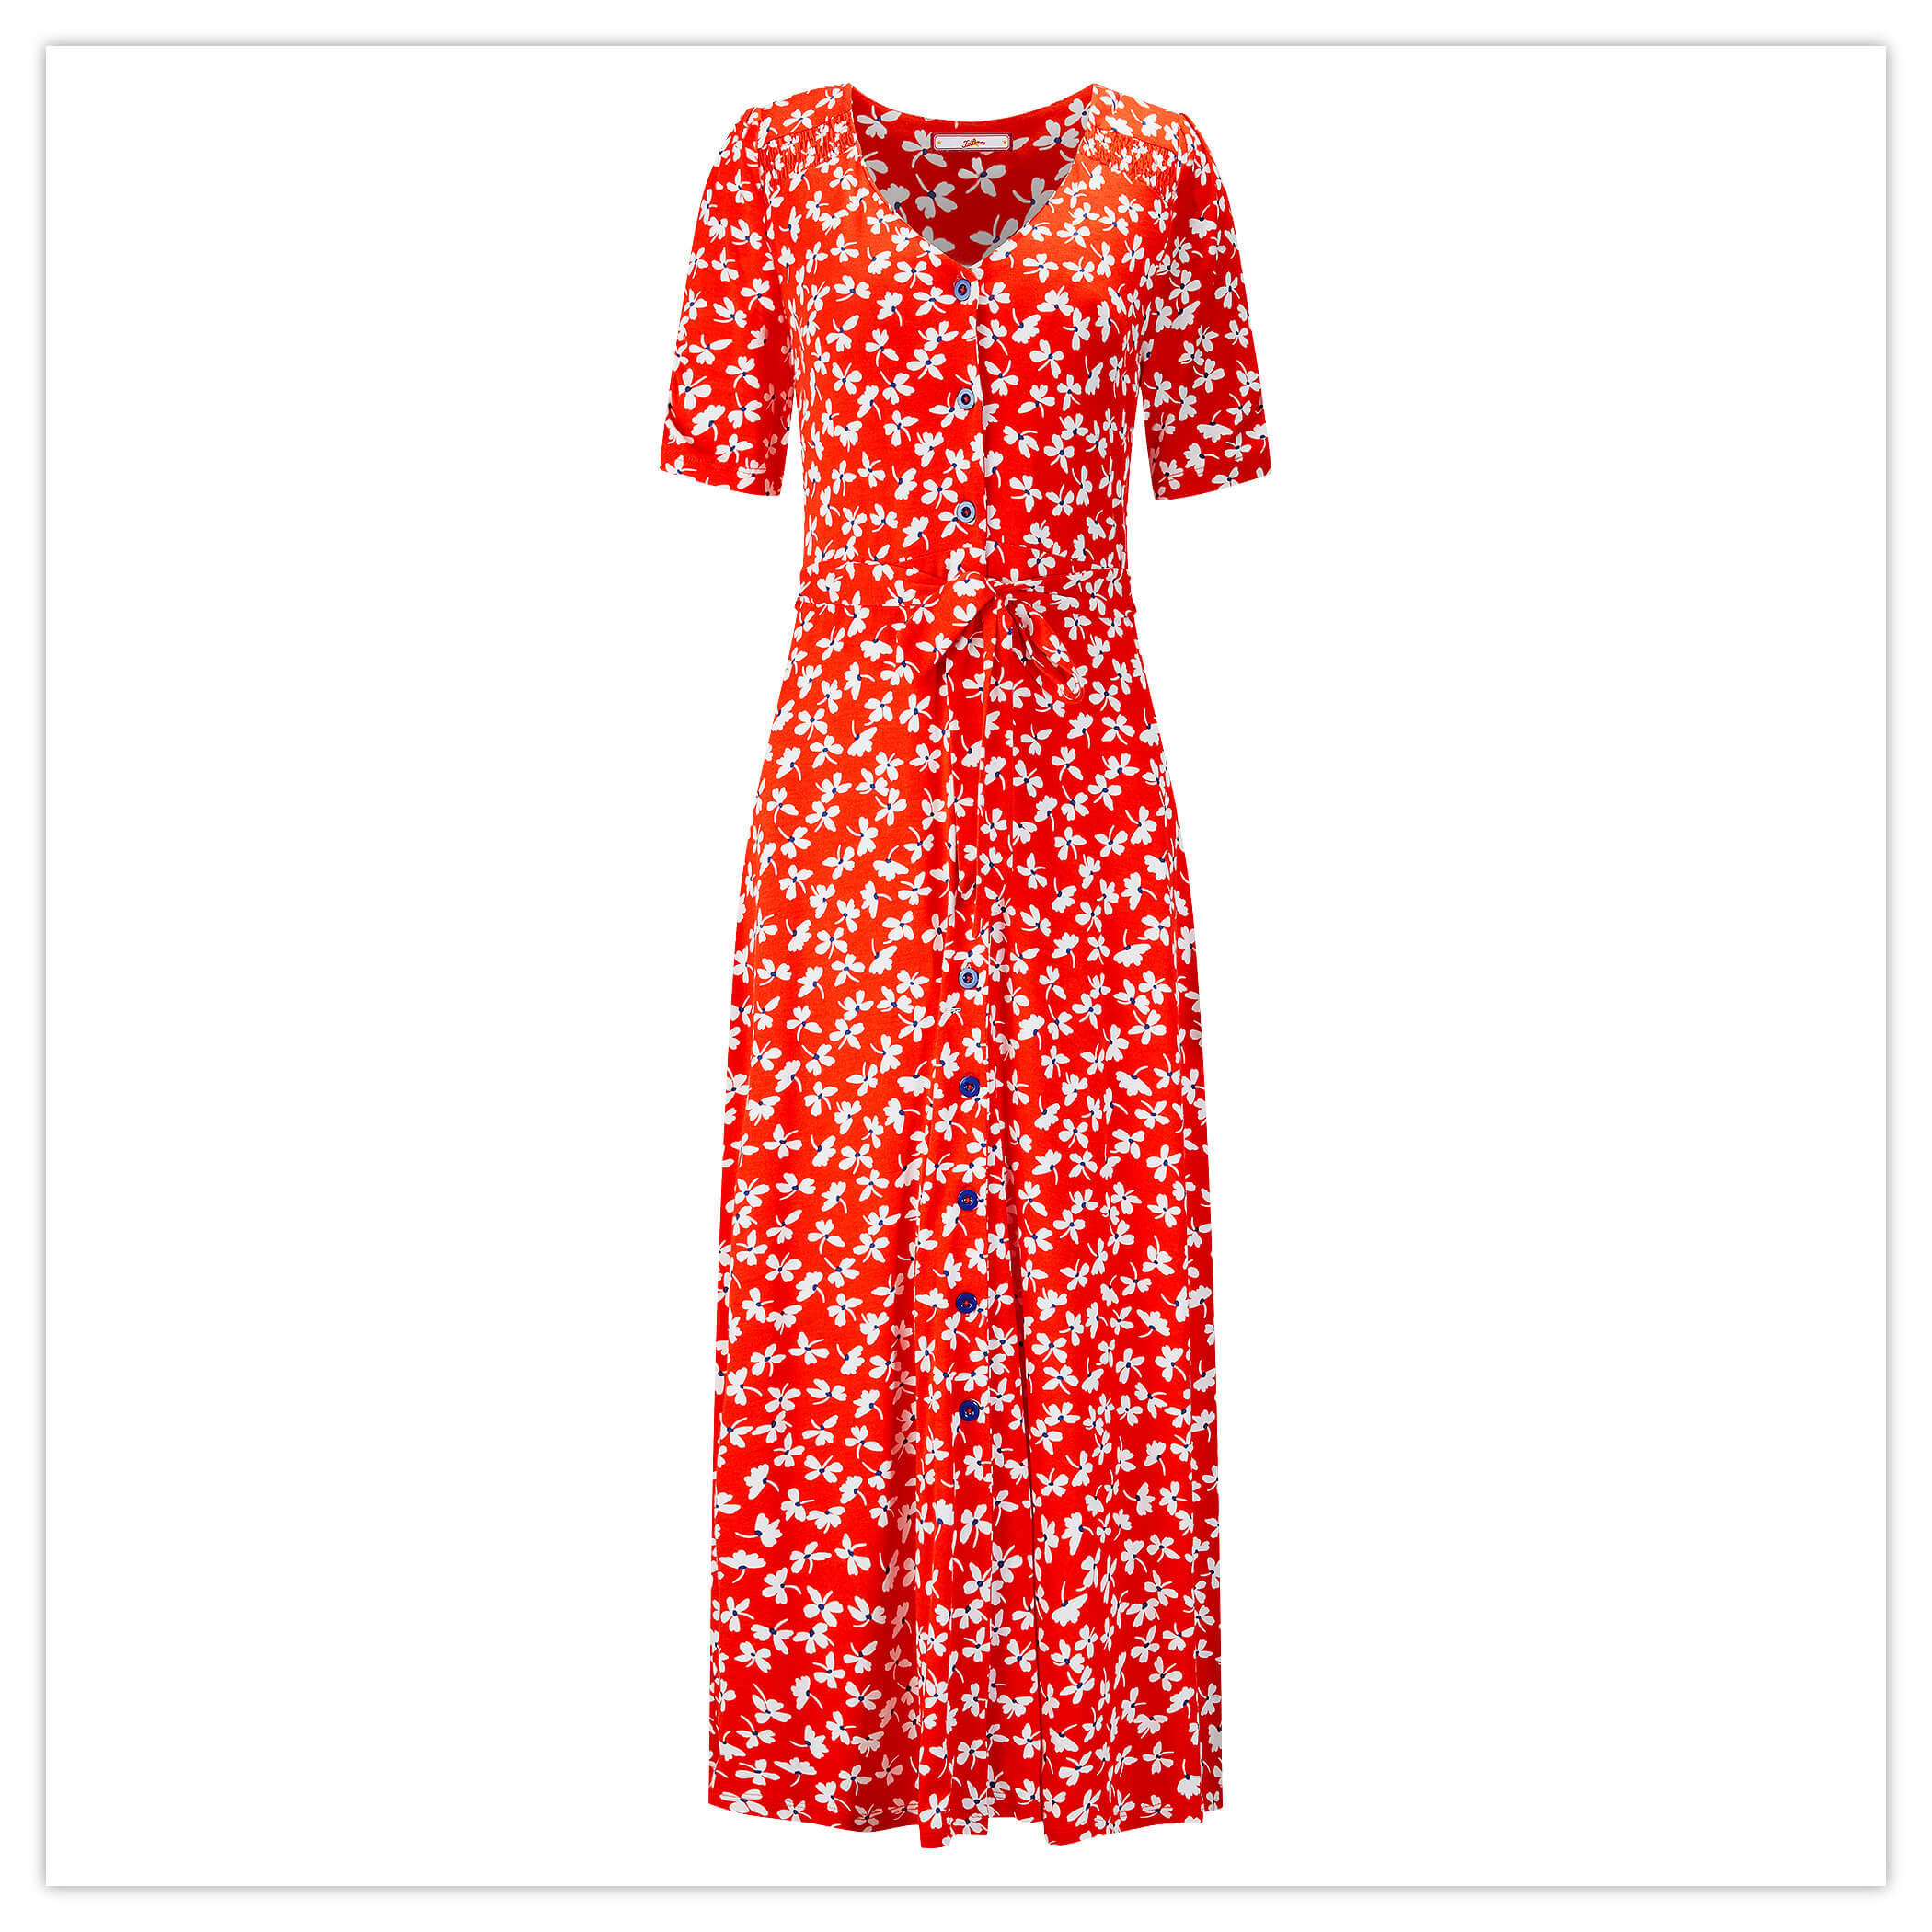 Joe Browns Vintage Jersey Dress